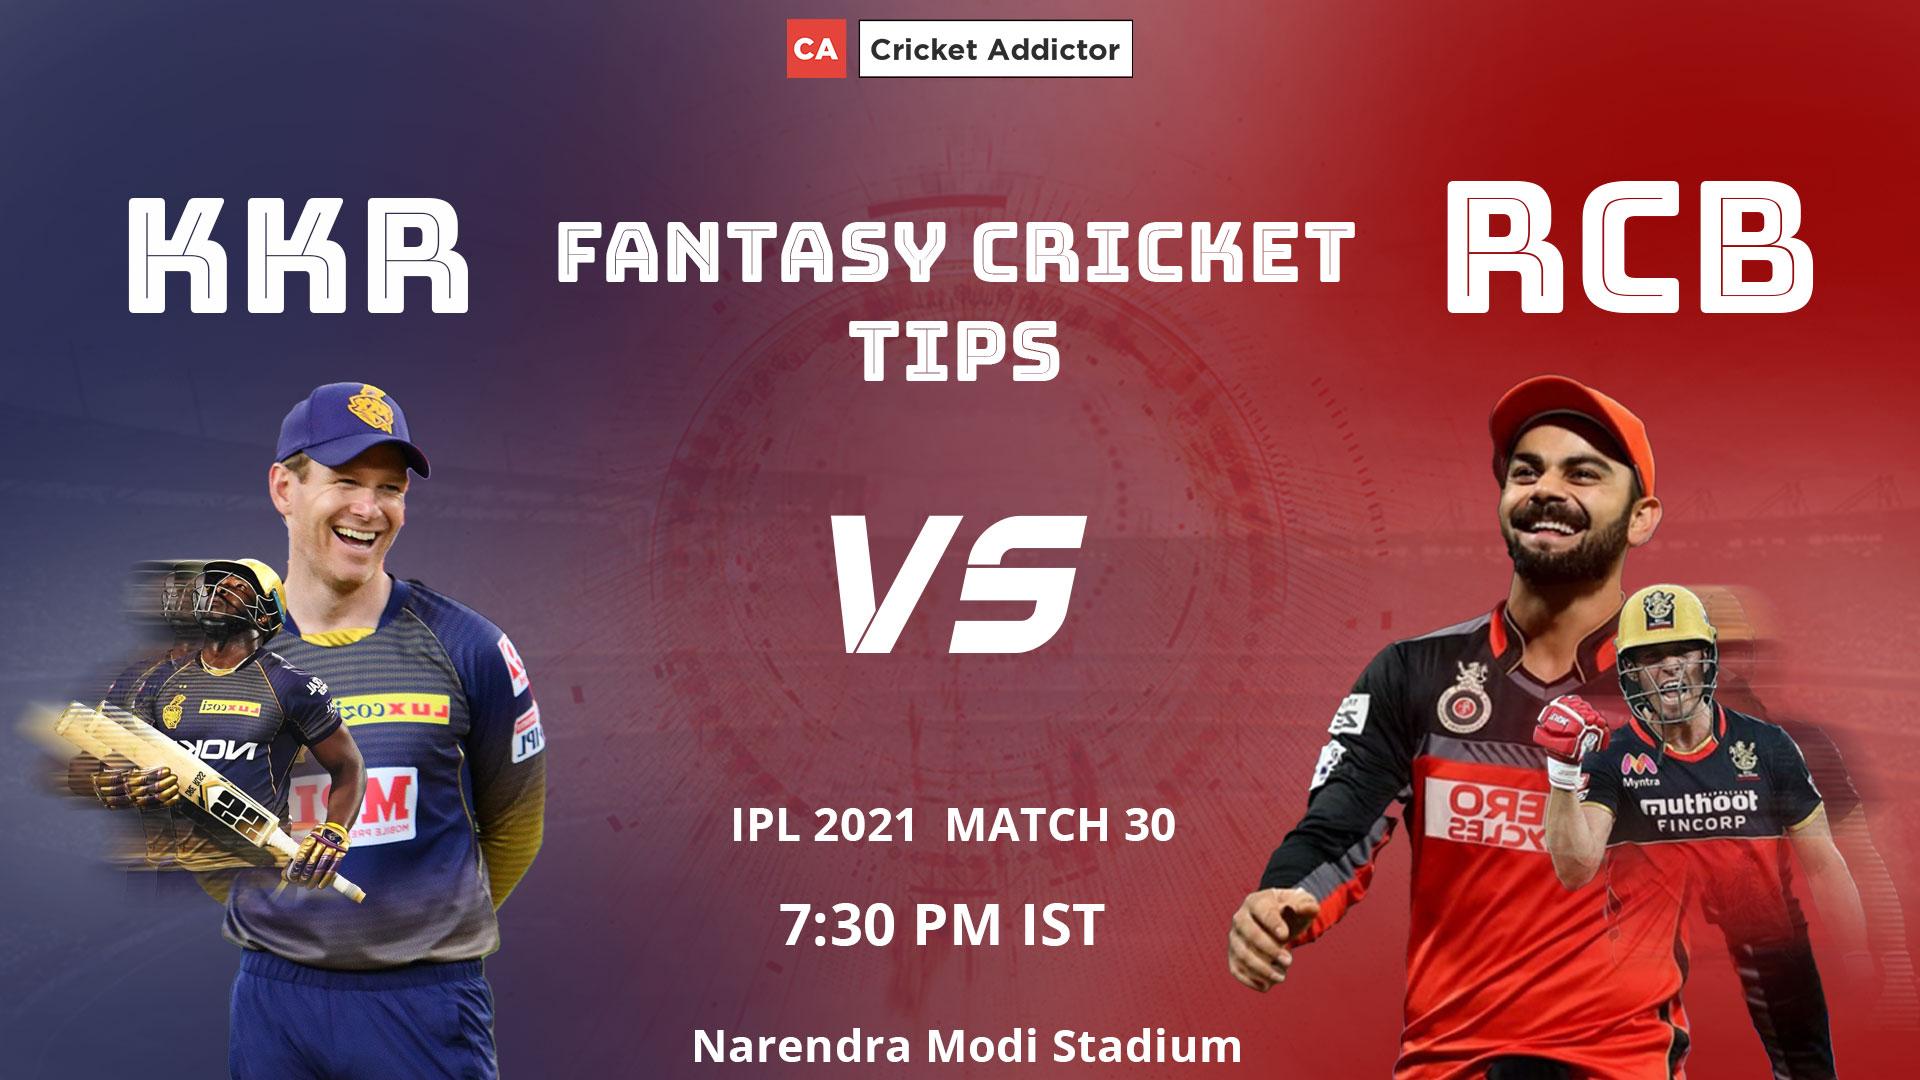 Kolkata Knight Riders (KKR) vs Royal Challengers Bangalore (RCB) Dream11 Prediction, Fantasy Cricket Tips, Playing XI, Pitch Report, Dream11 Team, Injury Update of VIVO IPL 2021